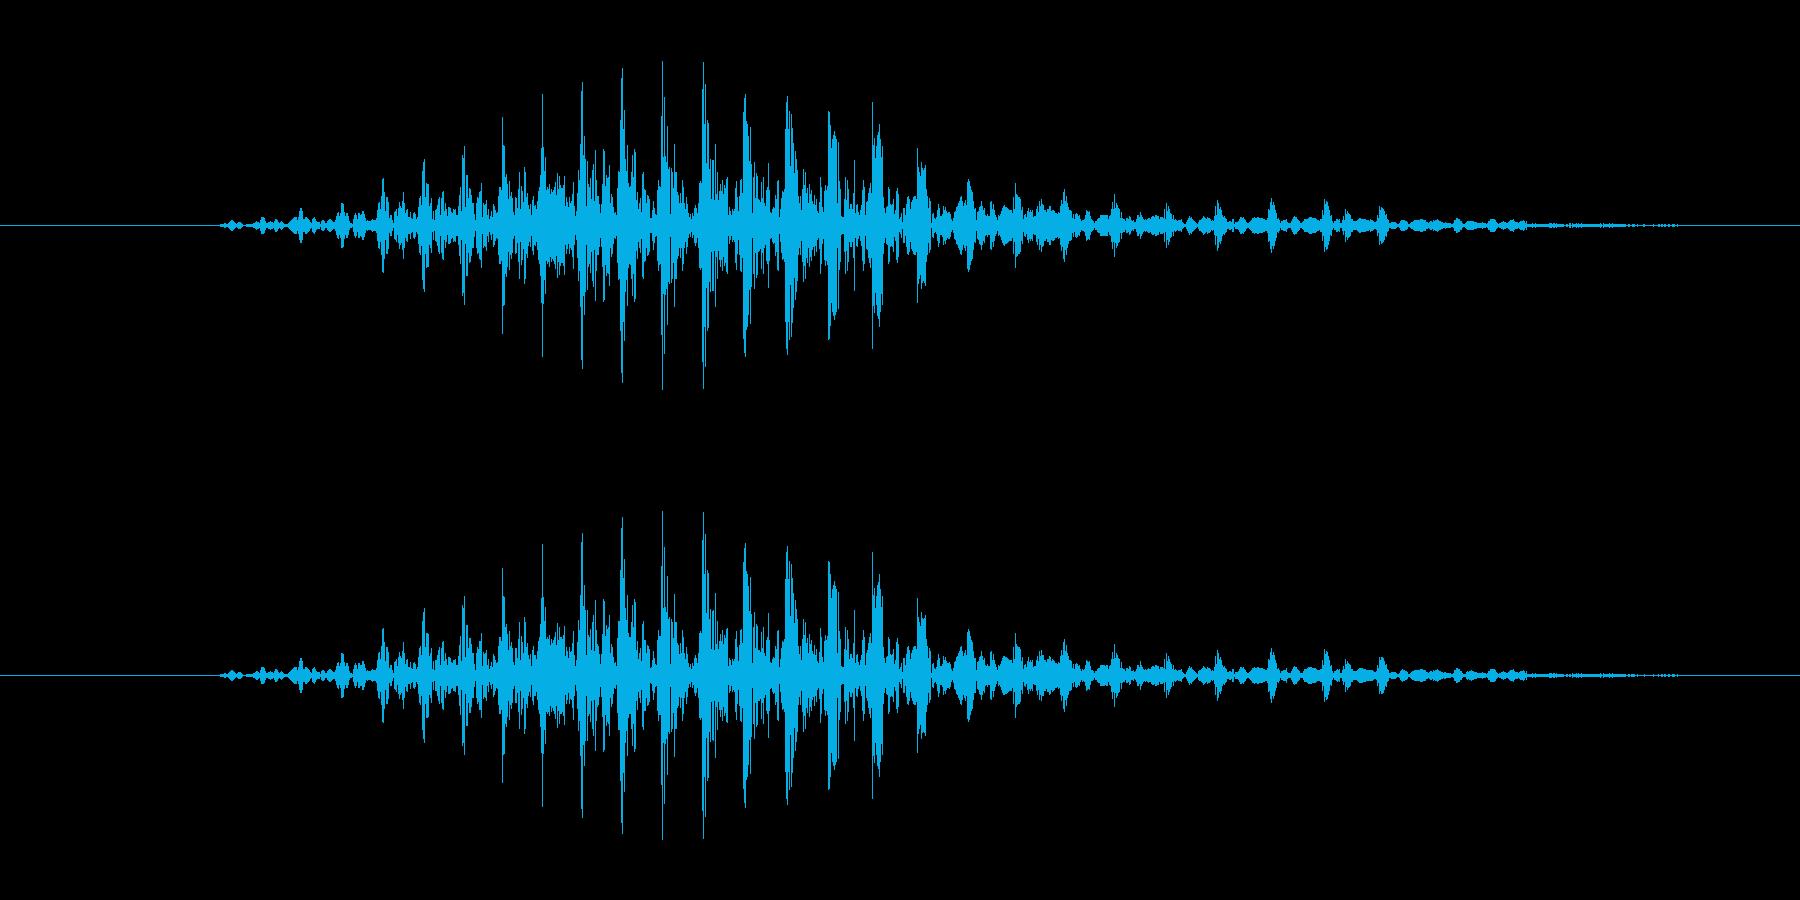 1 (One, 英語、米国男性声優:J…の再生済みの波形